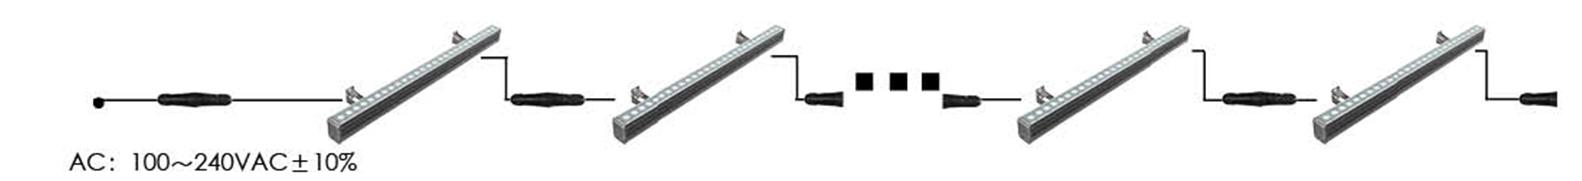 LED Fassadenstrahler Aluminiumprofilleuchte Linea einfärbig